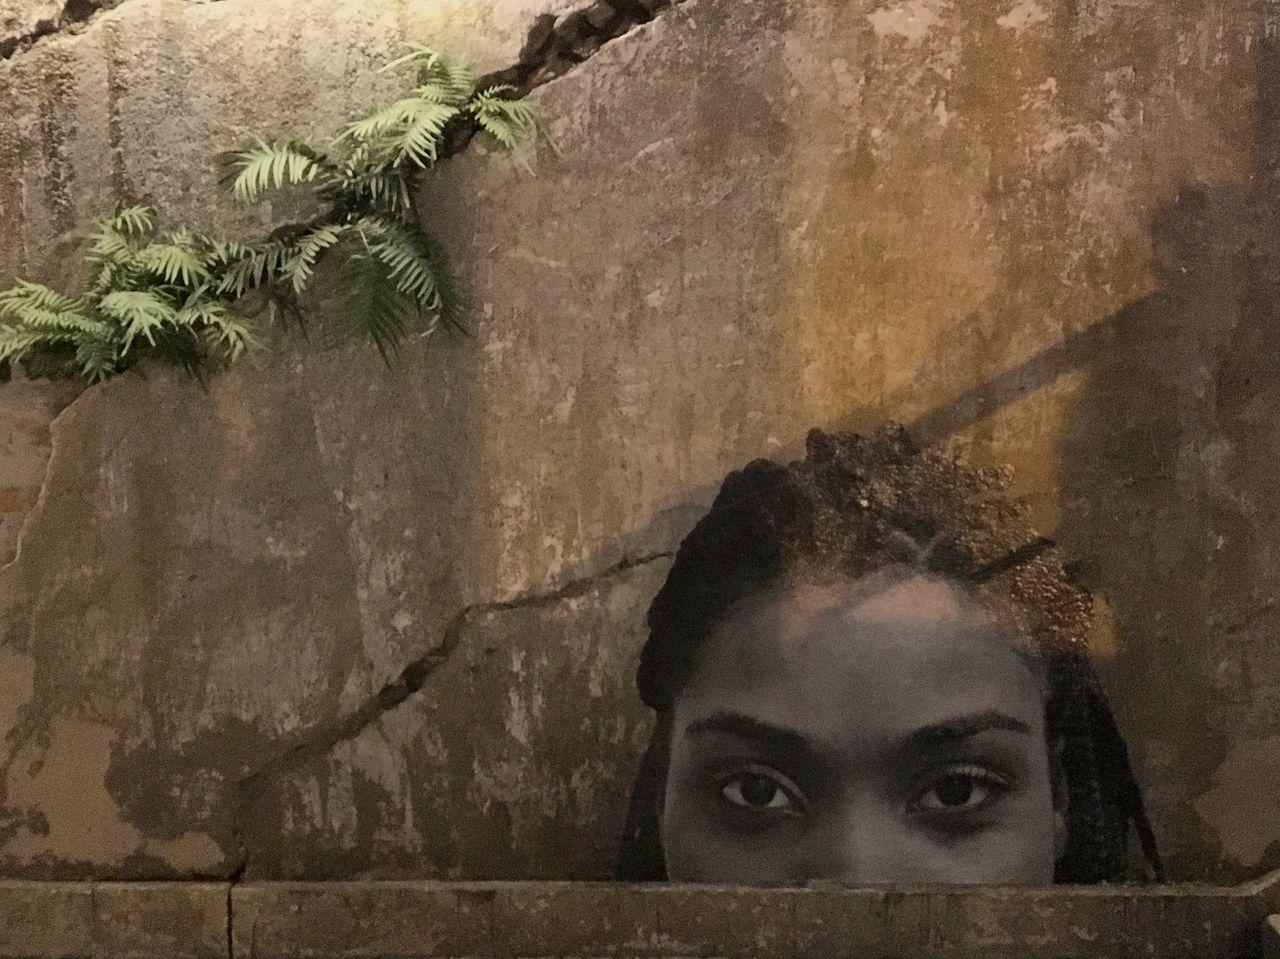 Look at me! Lookatme Human Face Headshot Real People Women Urban Photography Photo Art Streetart Sao Paulo - Brazil Projetoolhapramim